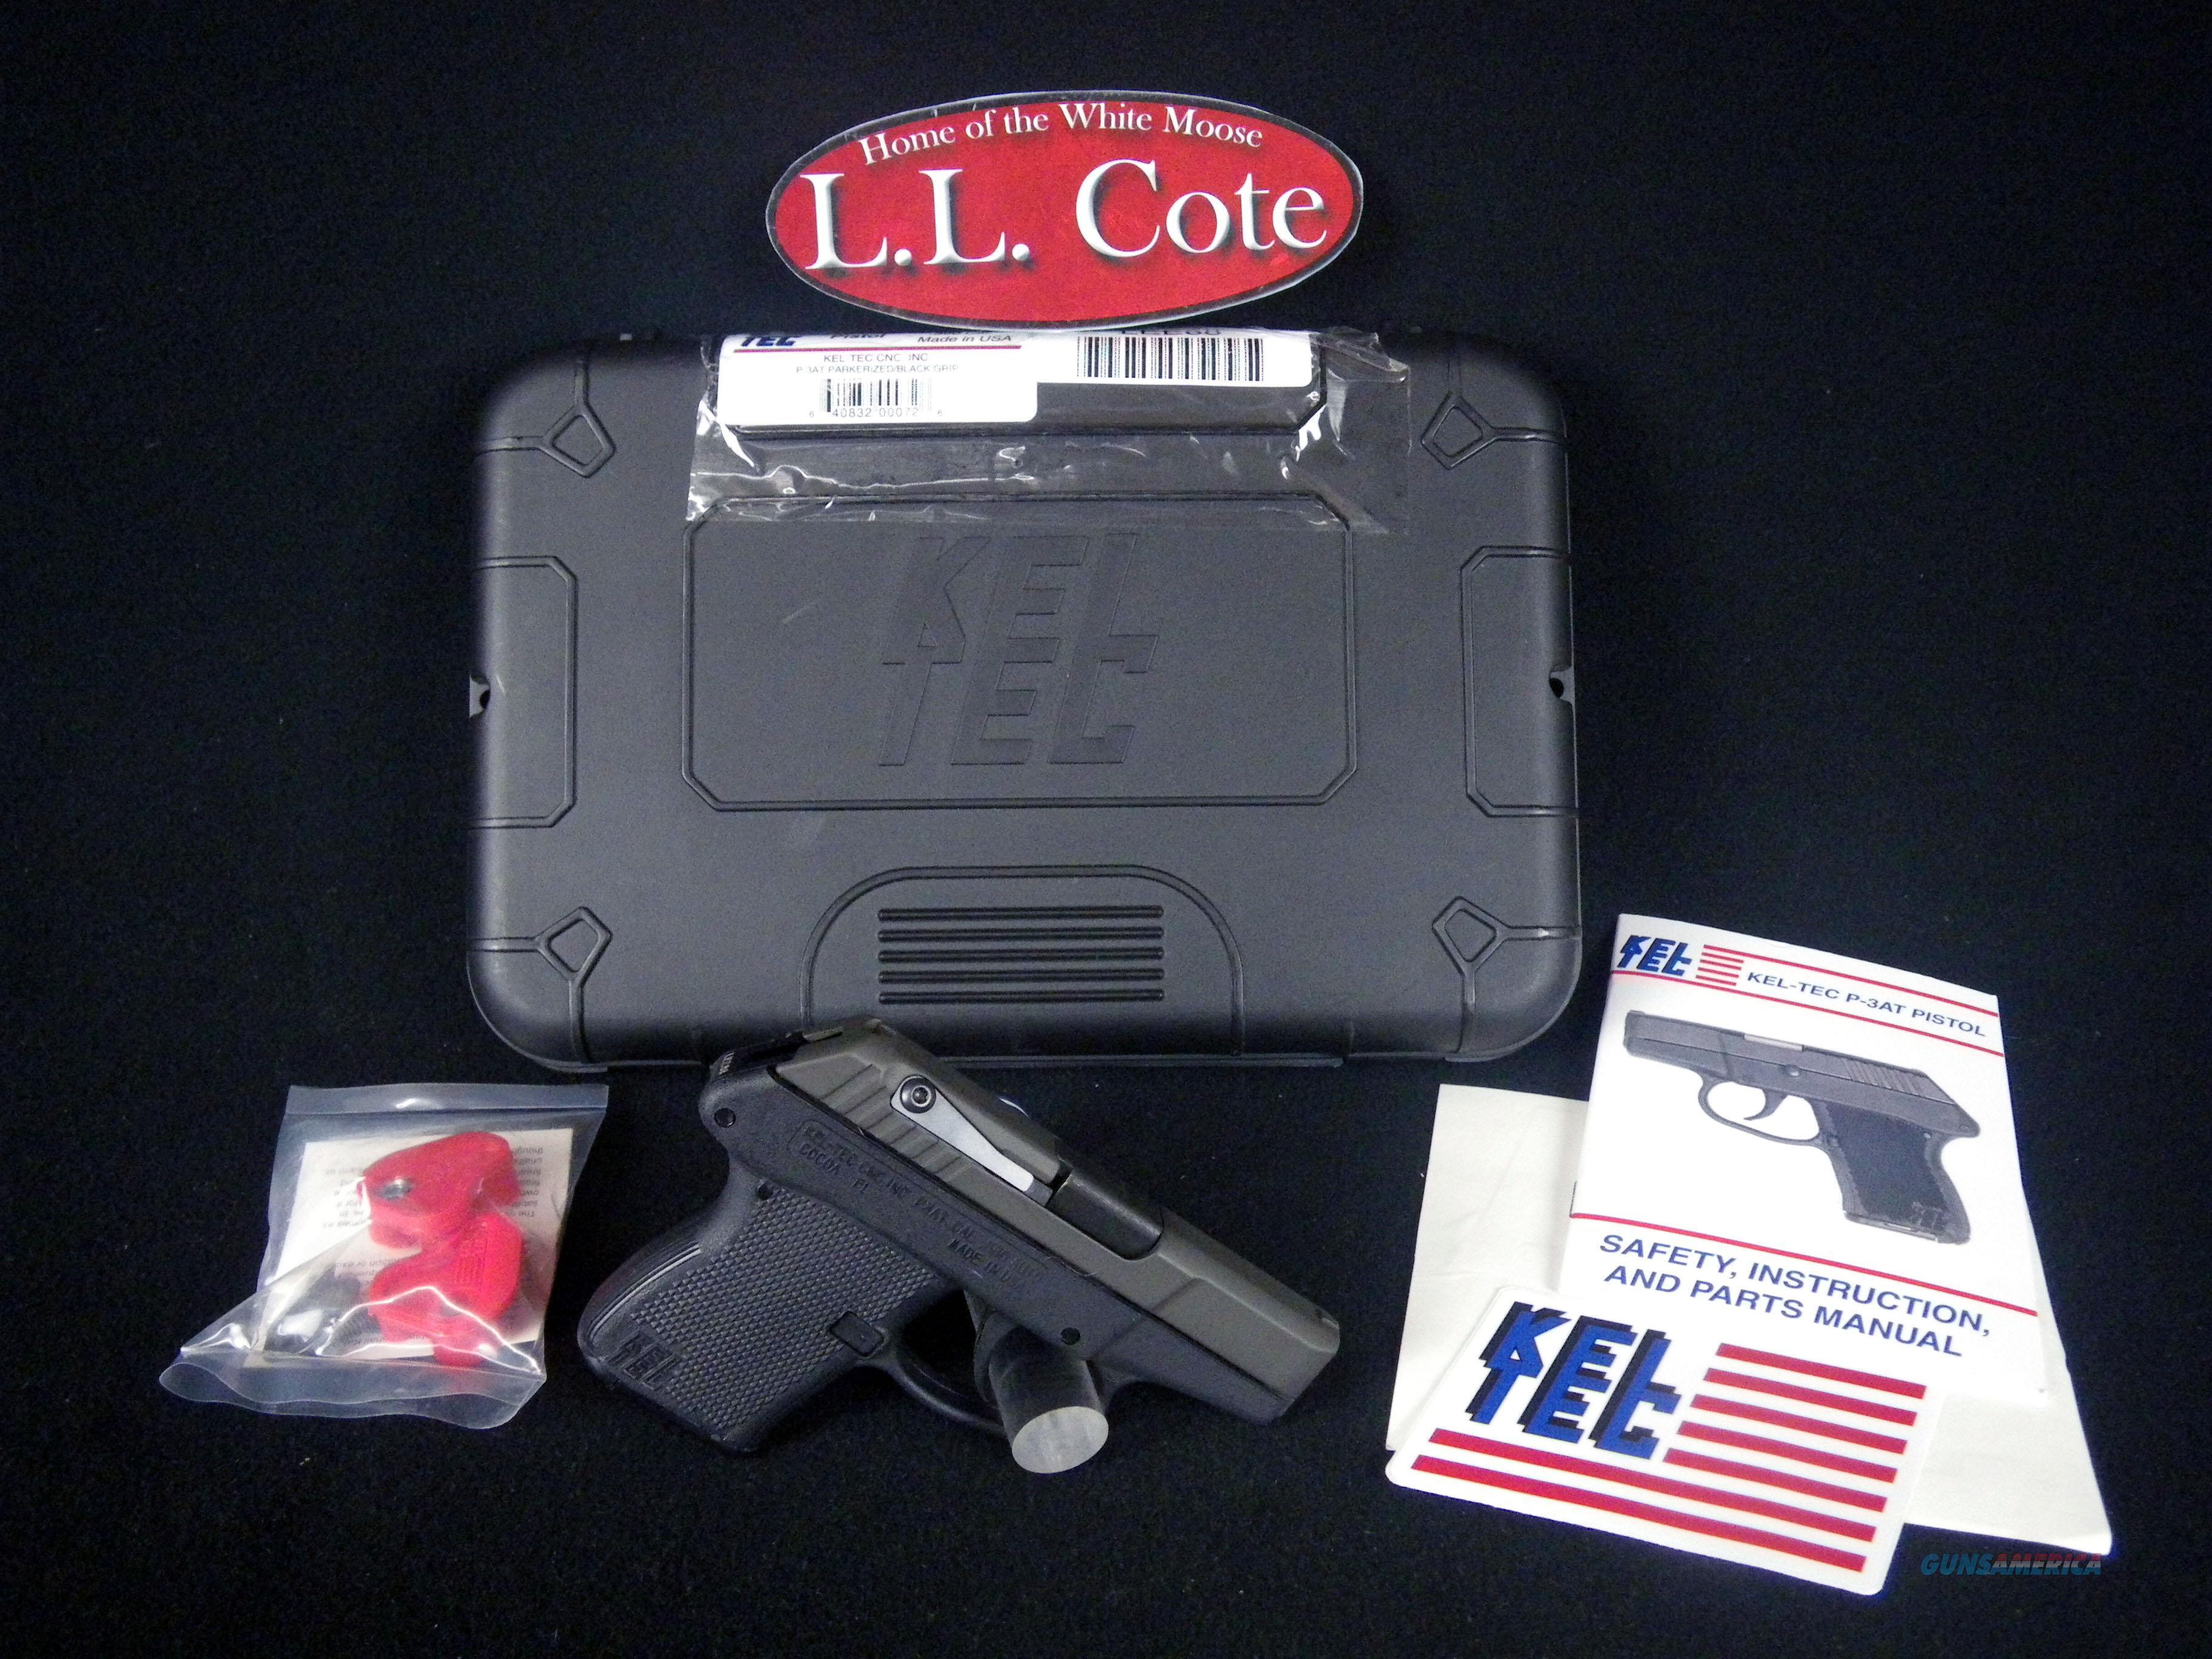 "Kel-Tec P-3AT 380ACP 2.75"" NEW Parkerized P3ATPKBLK  Guns > Pistols > Kel-Tec Pistols > Pocket Pistol Type"